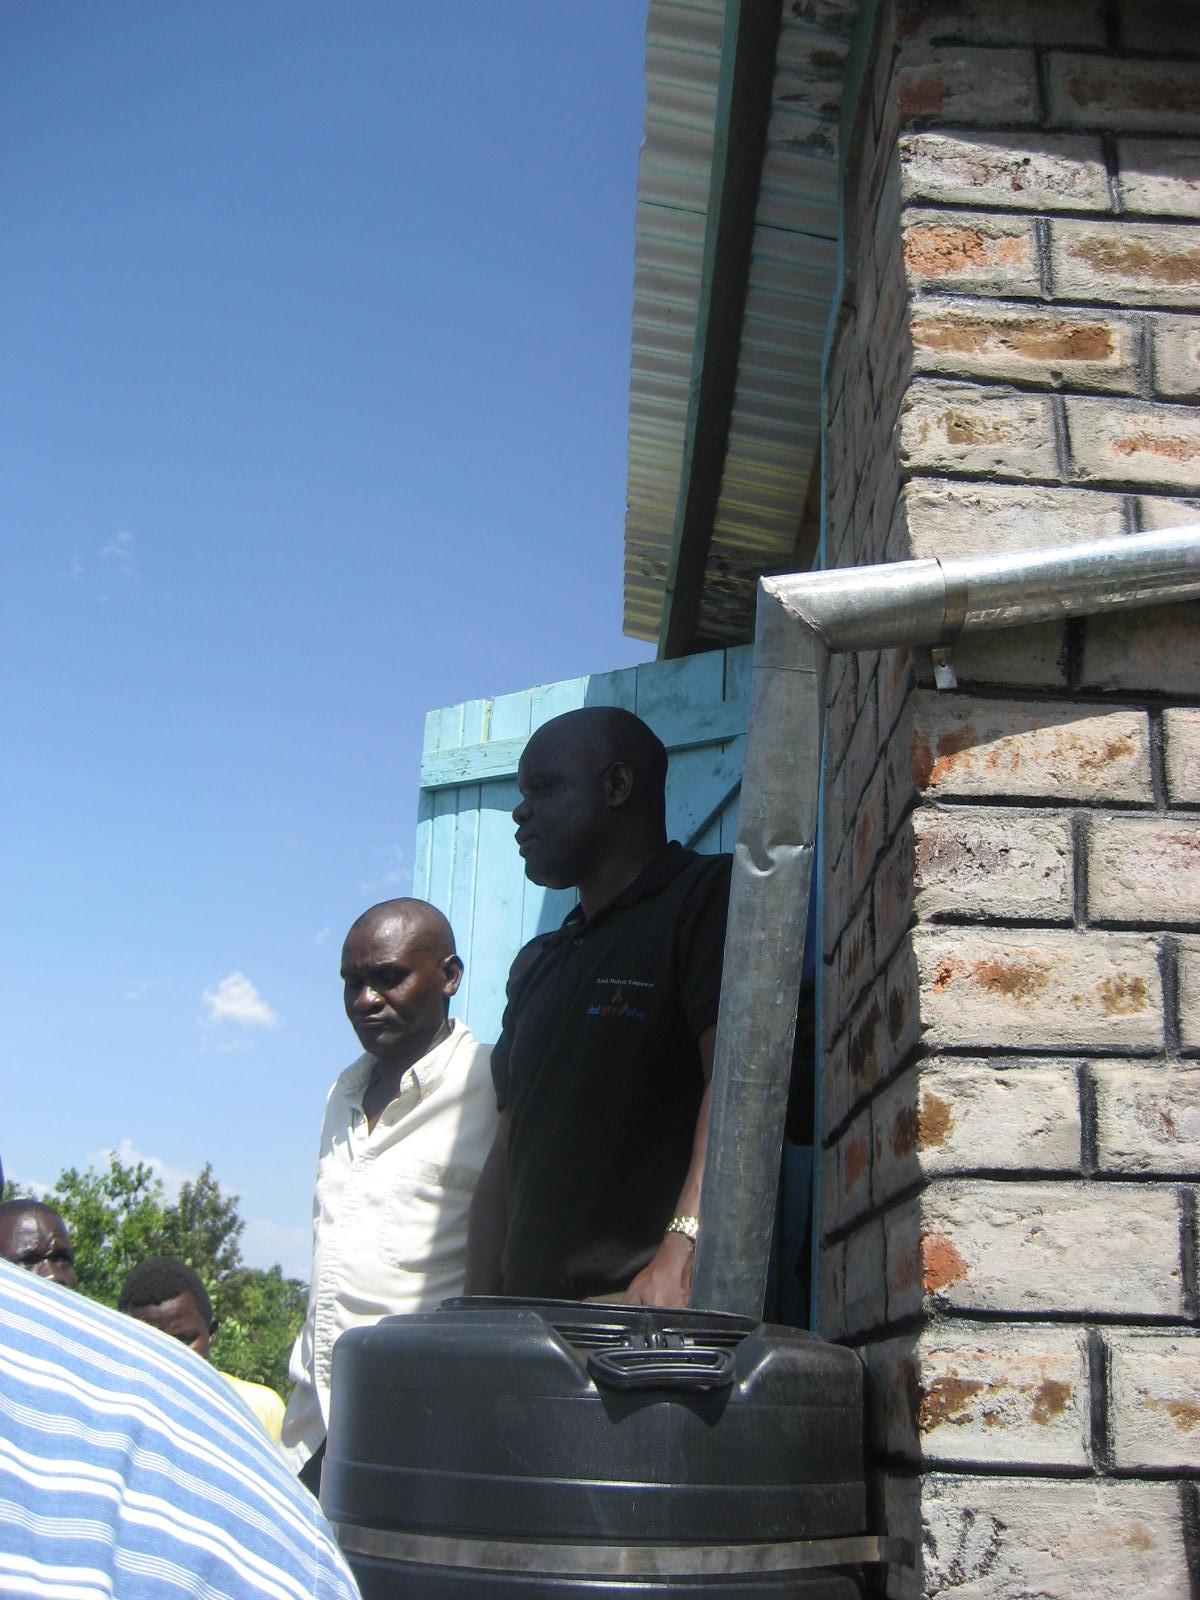 Description rainwater harvesting system jpg - File Rainwater Harvesting System 3441562258 Jpg